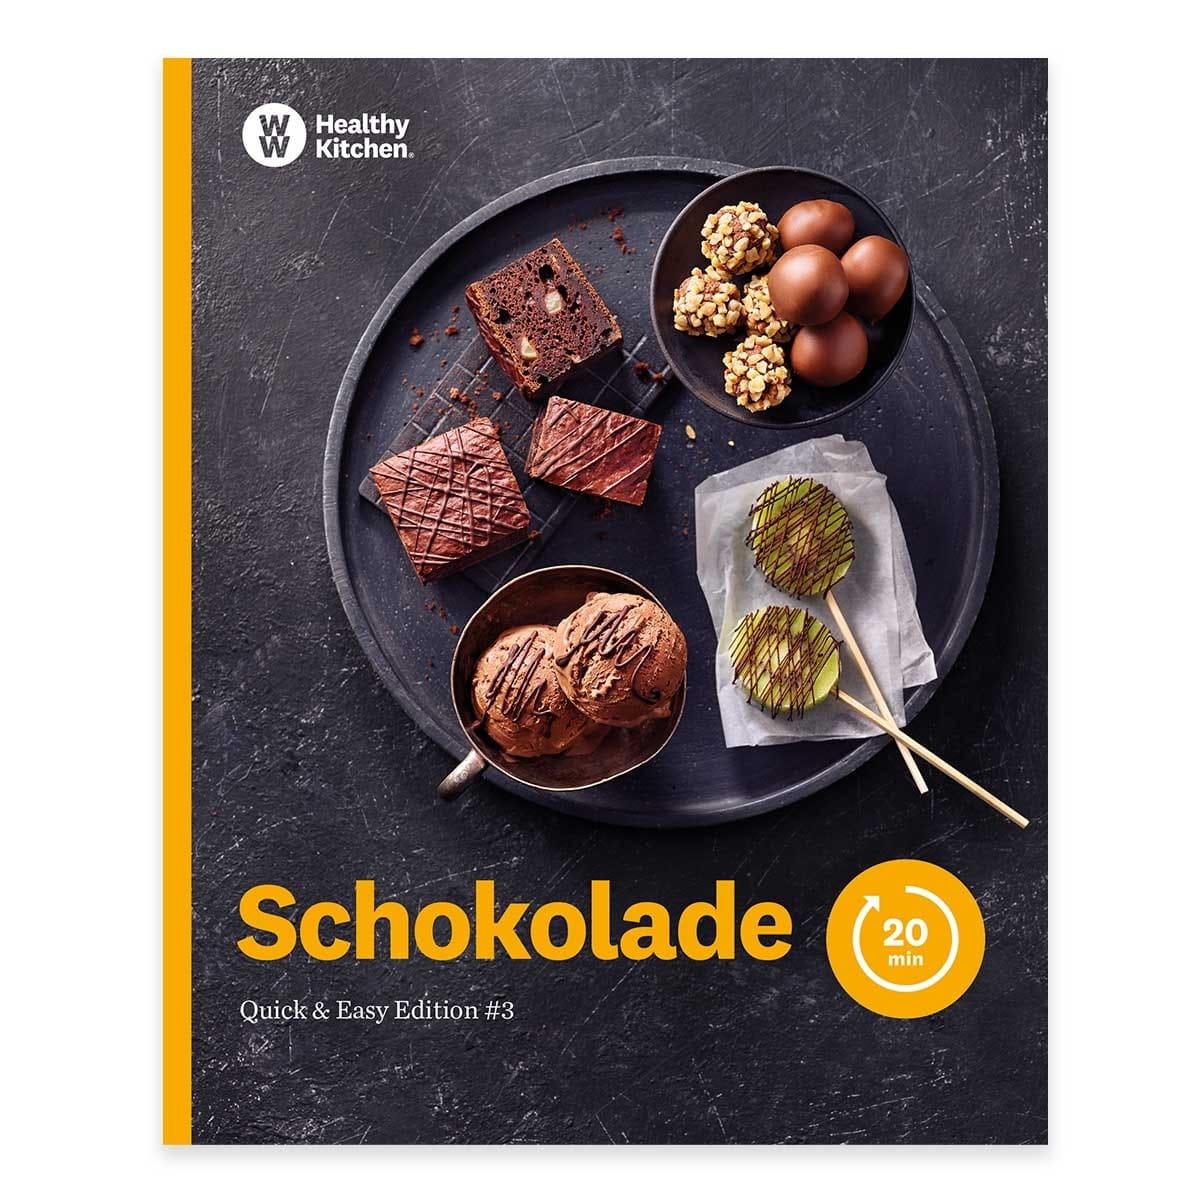 "WW Kochbuch ""Schokolade"", #3 Quickies (20 Rezepte)"